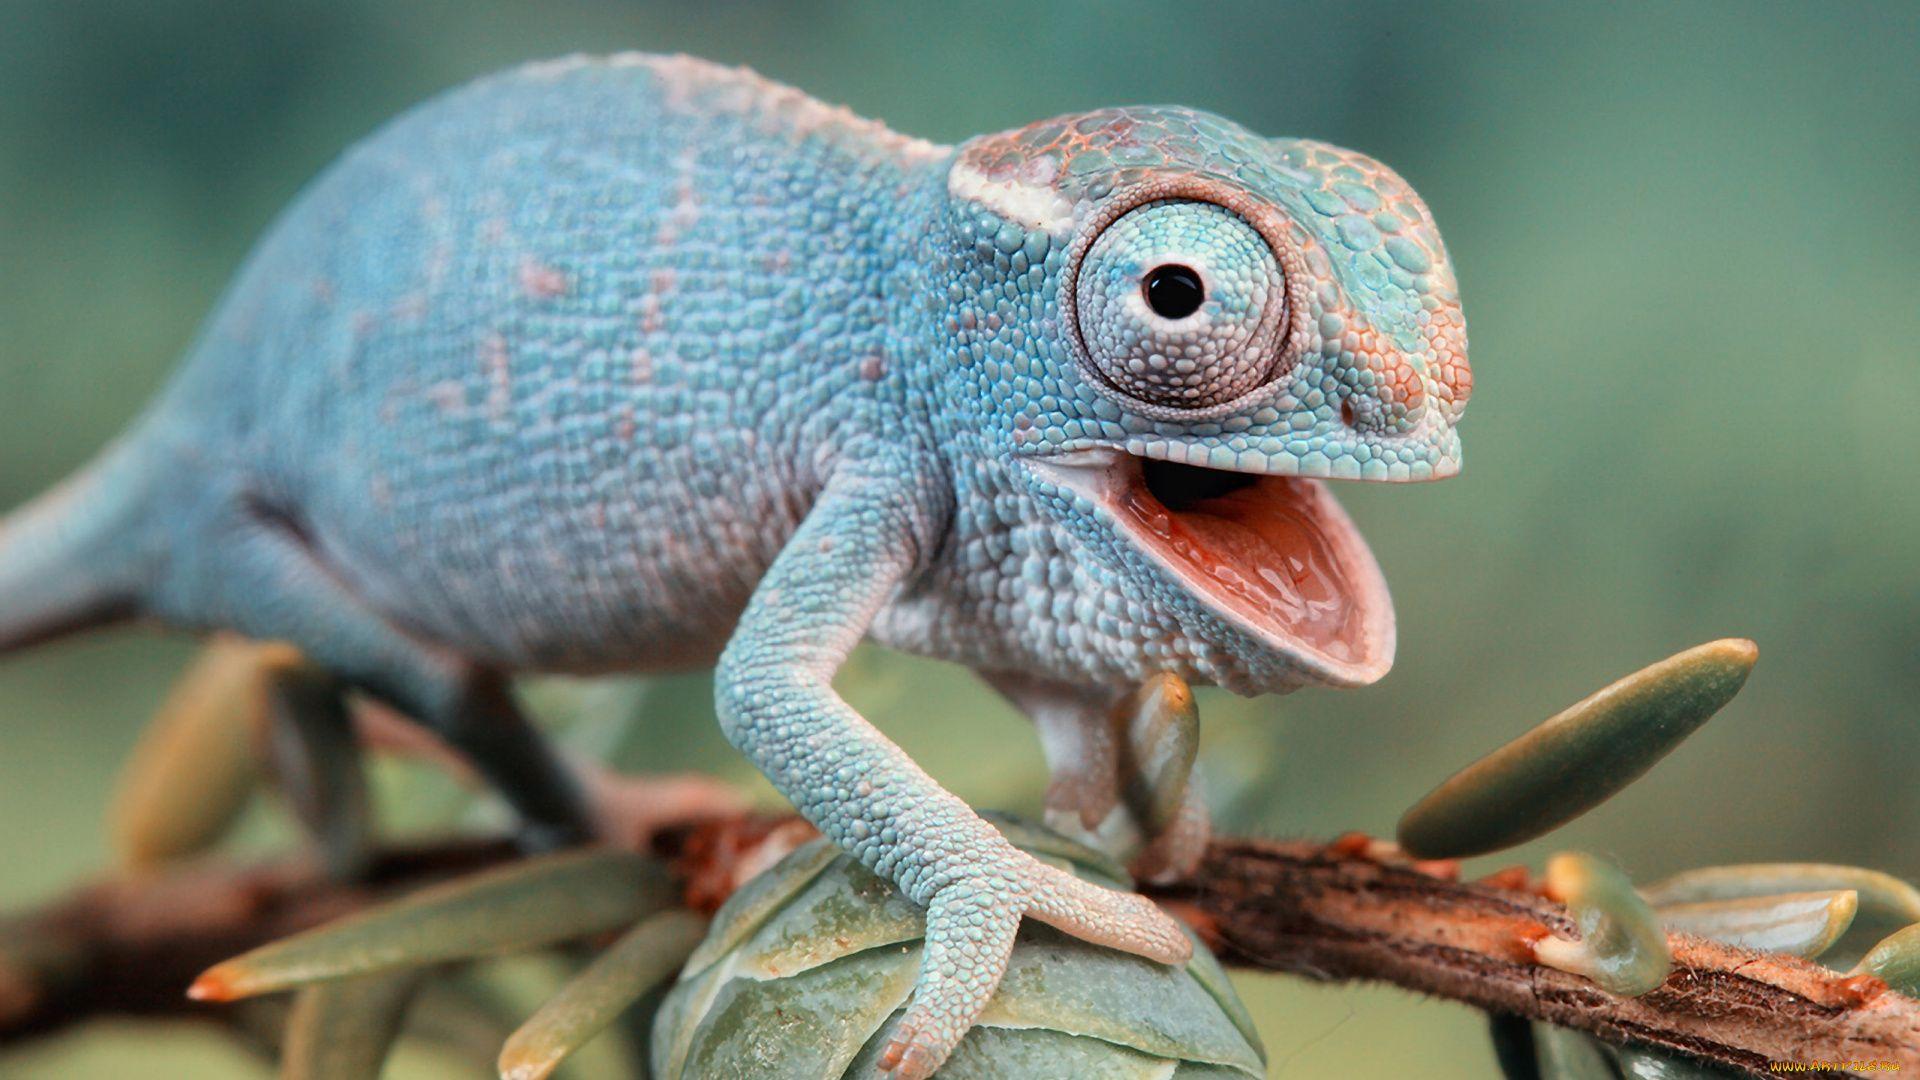 Chameleon On A Branch Photo